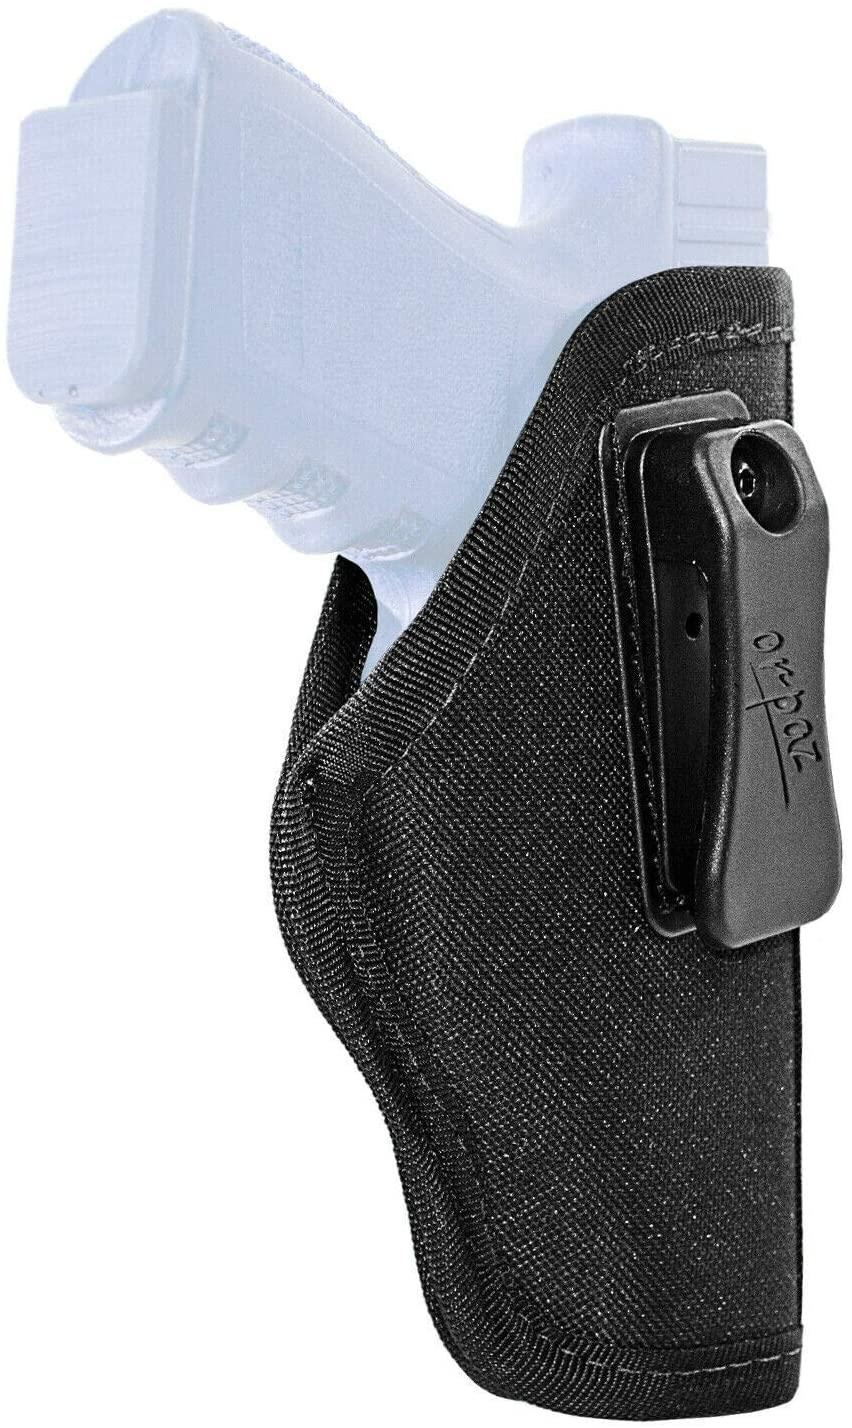 Orpaz Gun Holster for Glock 43X Holster, Right Hand